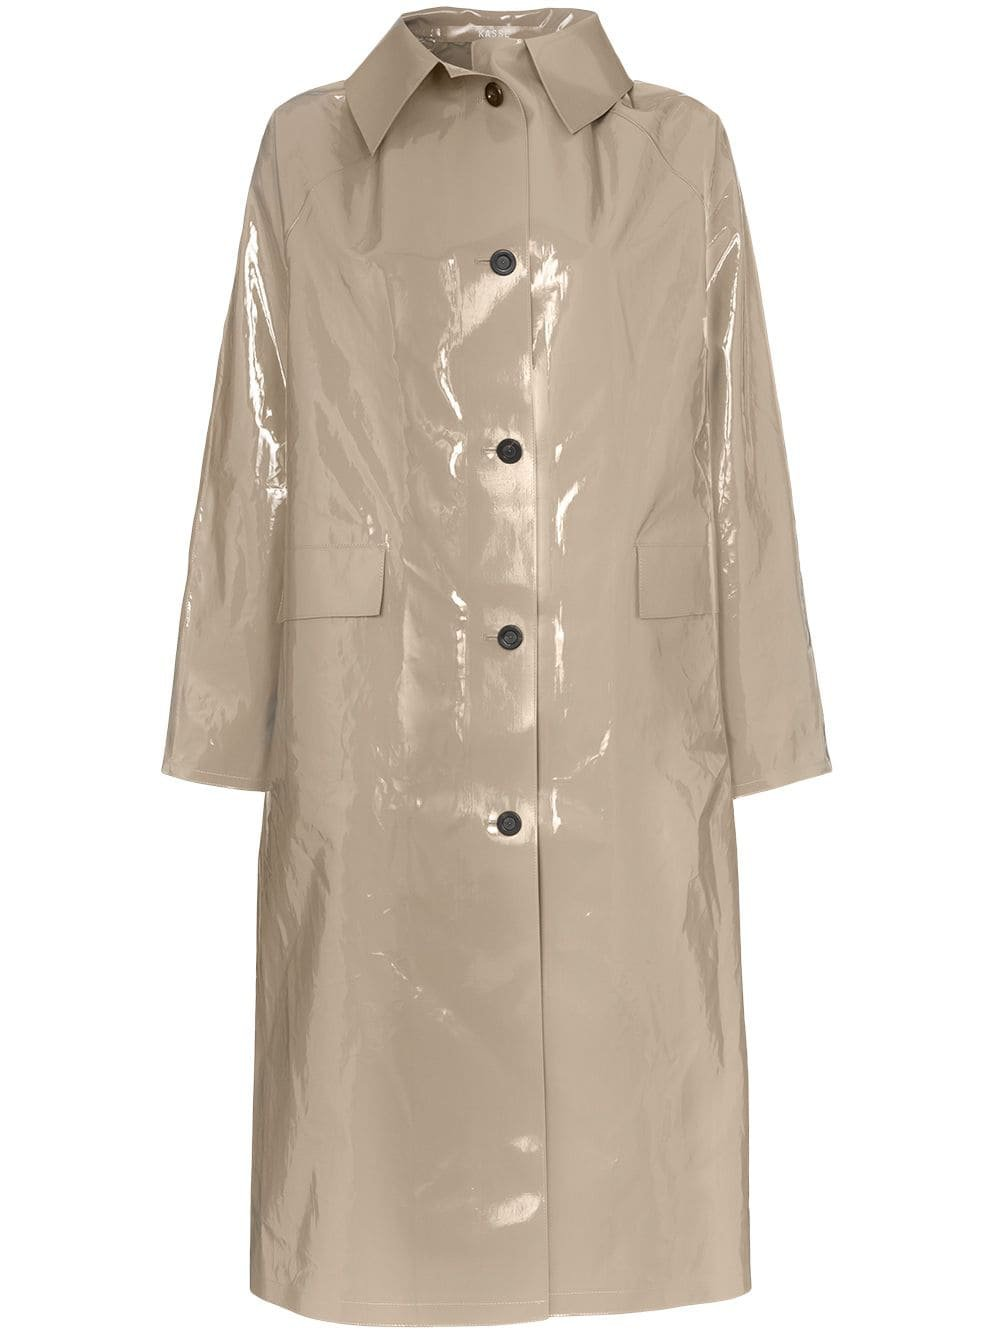 Kassl Patent Buttoned Cotton Blend Coat - Farfetch